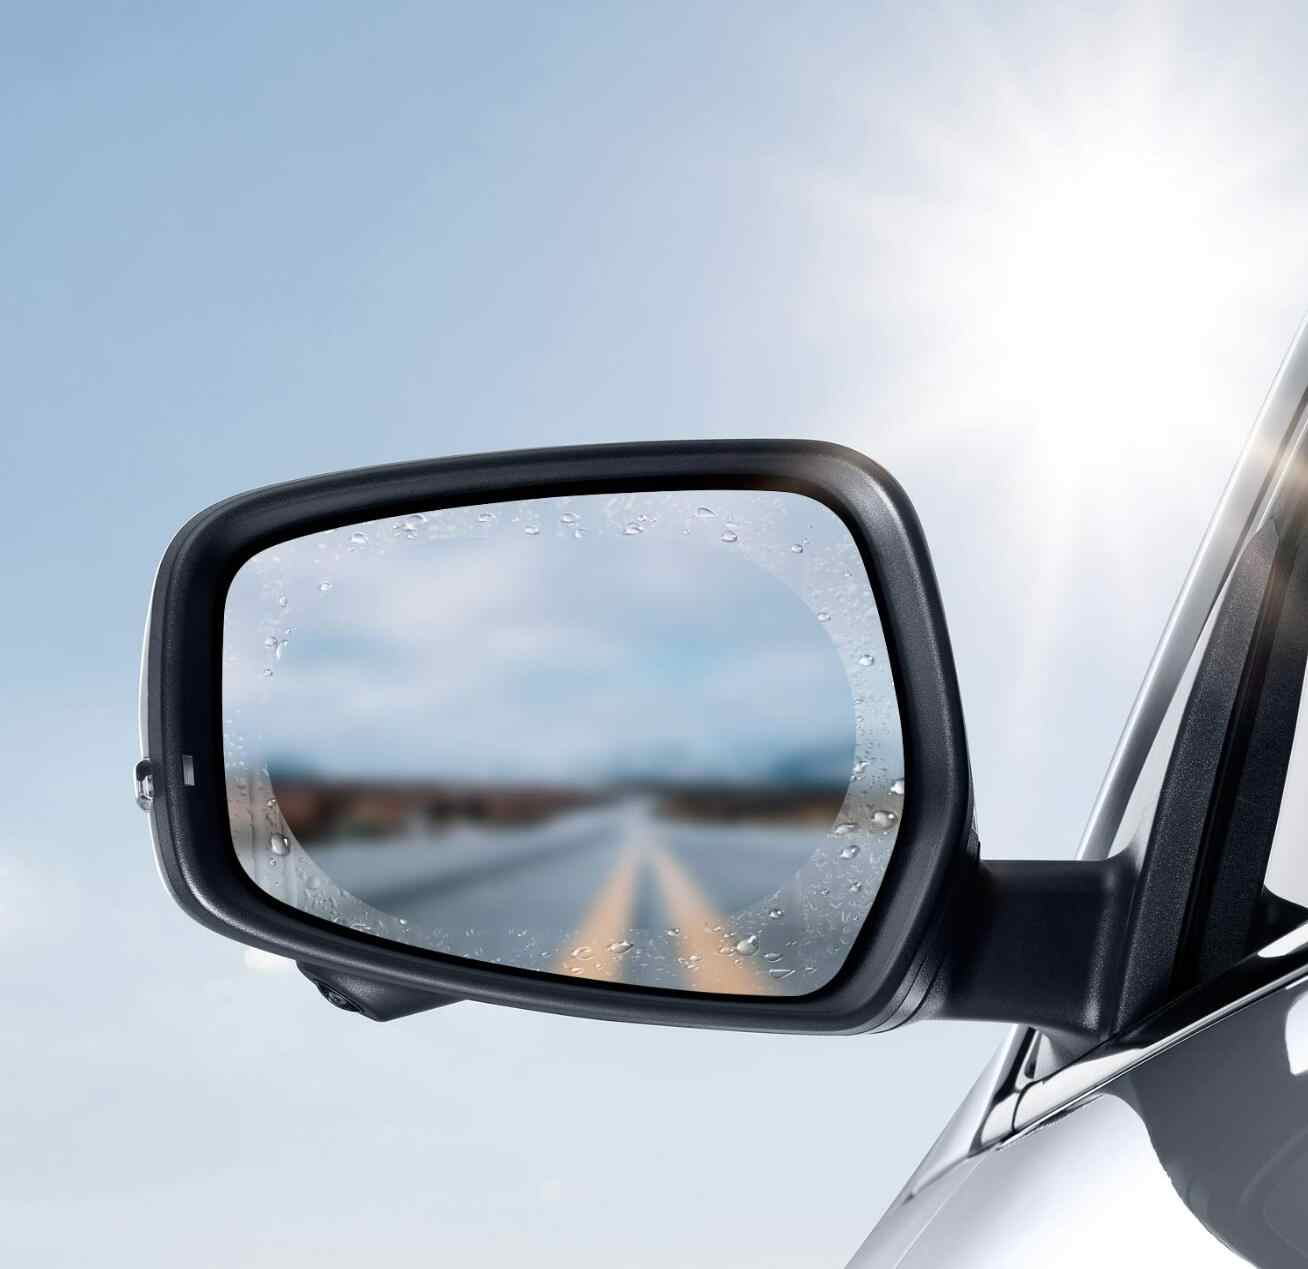 Retrovisor de coche película protectora para espejo para Toyota Prius Levin corona Avensis Previa FJ Cruiser Venza Sienna Alphard ZELAS HIACE